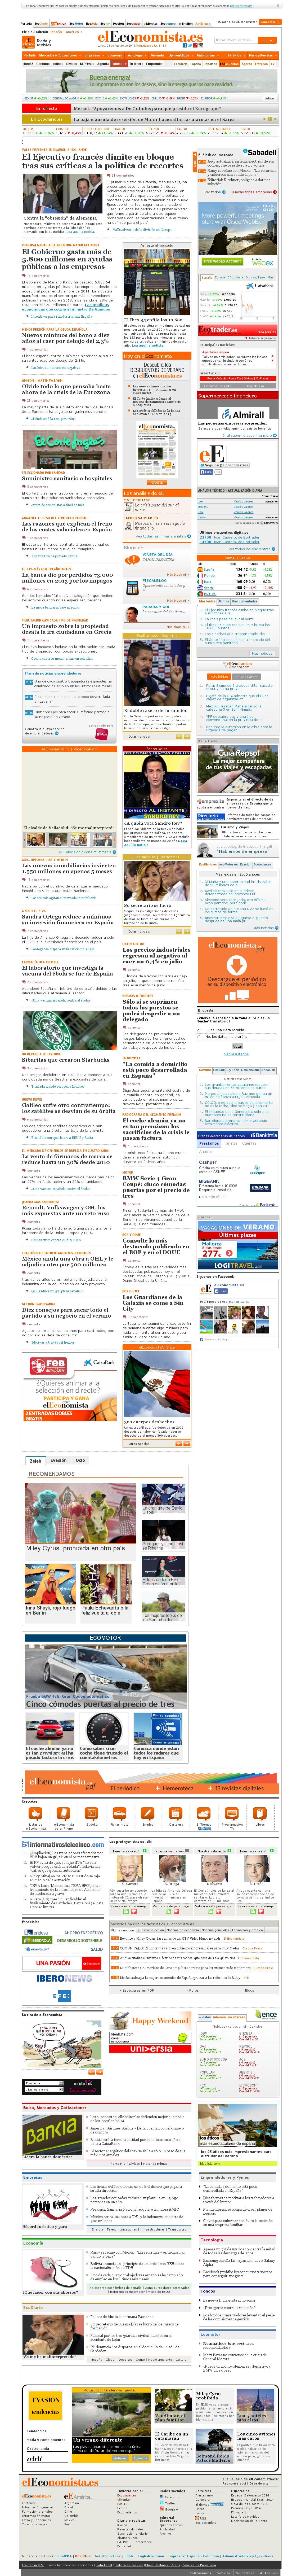 elEconomista at Monday Aug. 25, 2014, 10:05 a.m. UTC